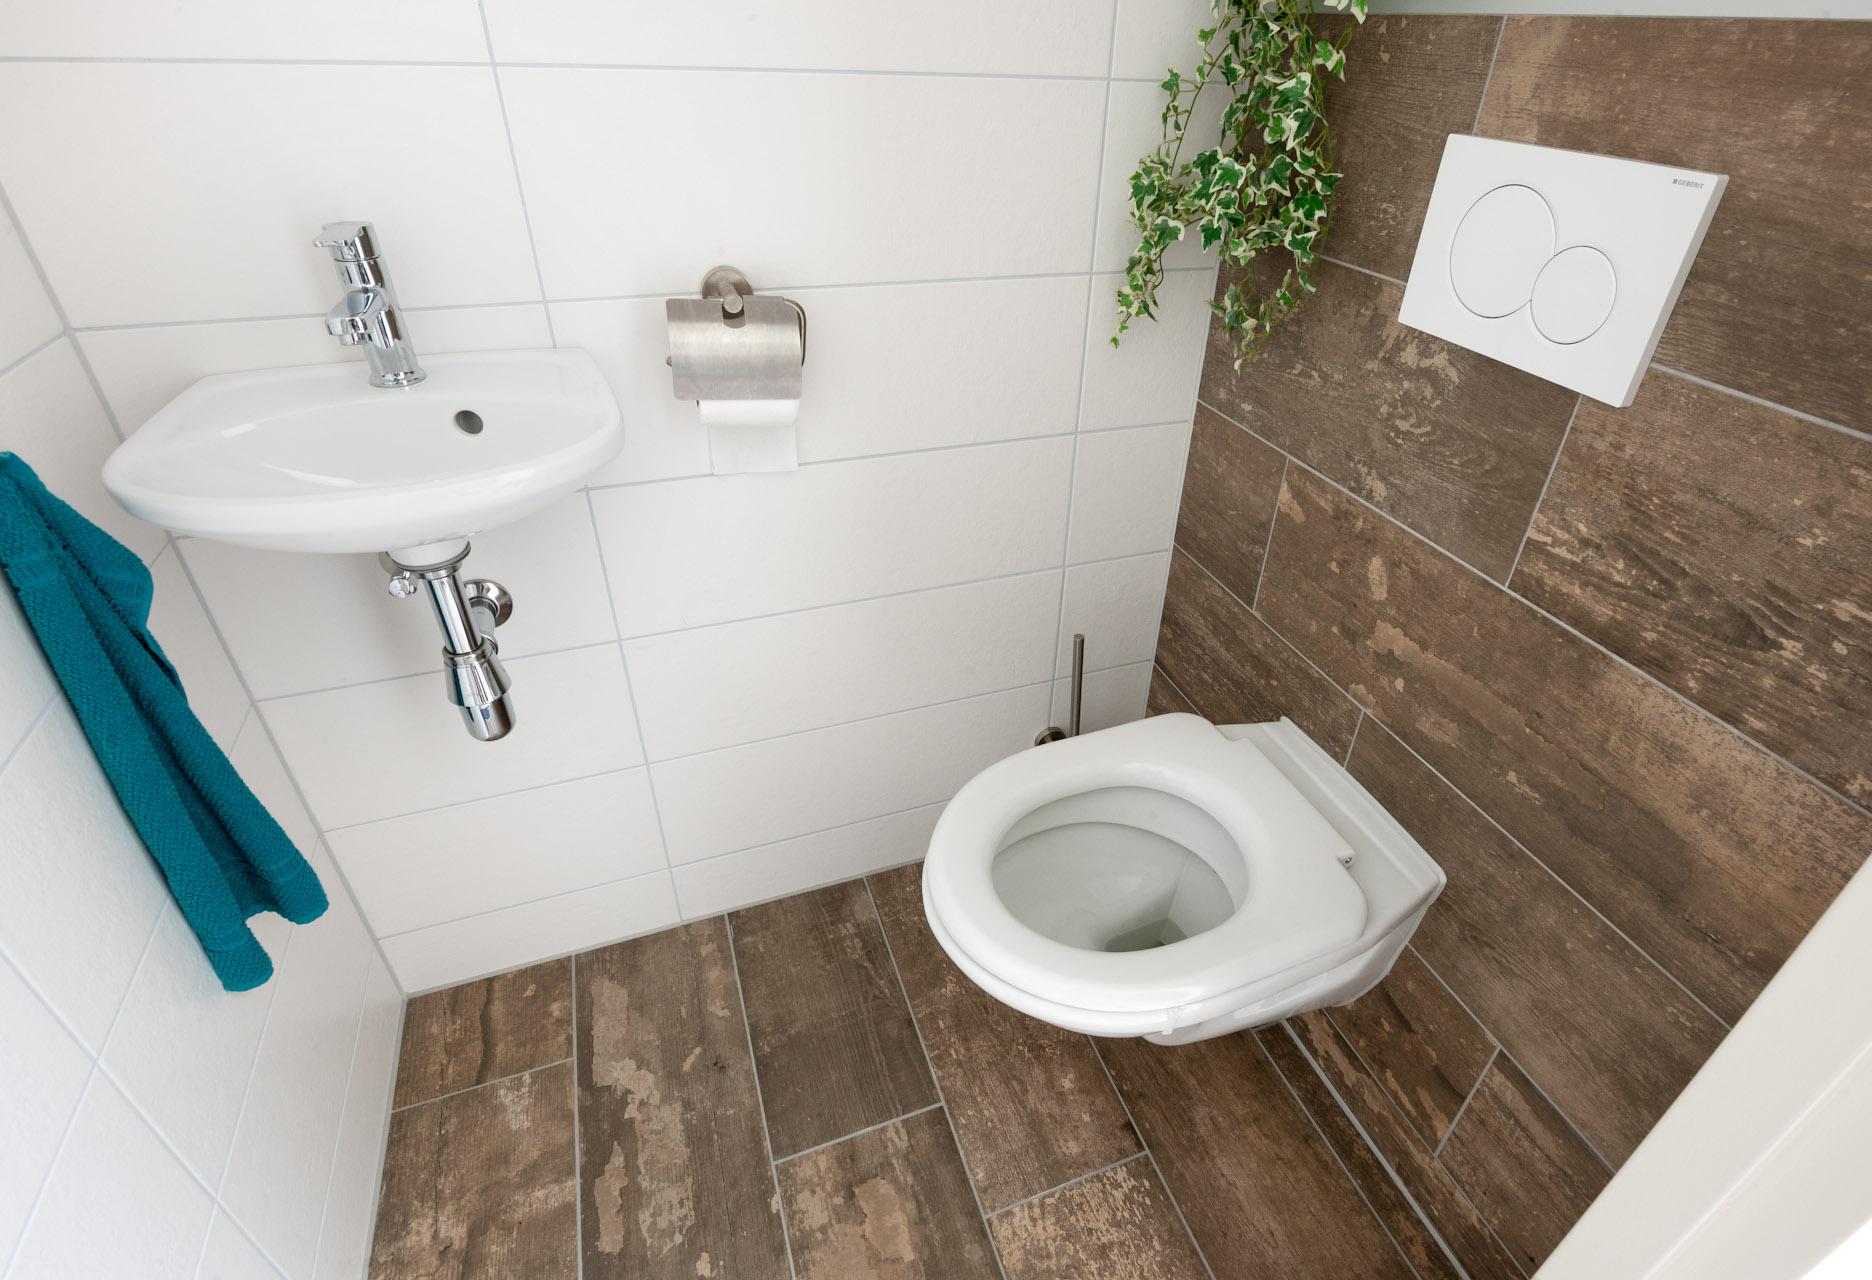 Keuken Tegels Verven : Tegels schilderen badkamer affordable betonverf over tegels